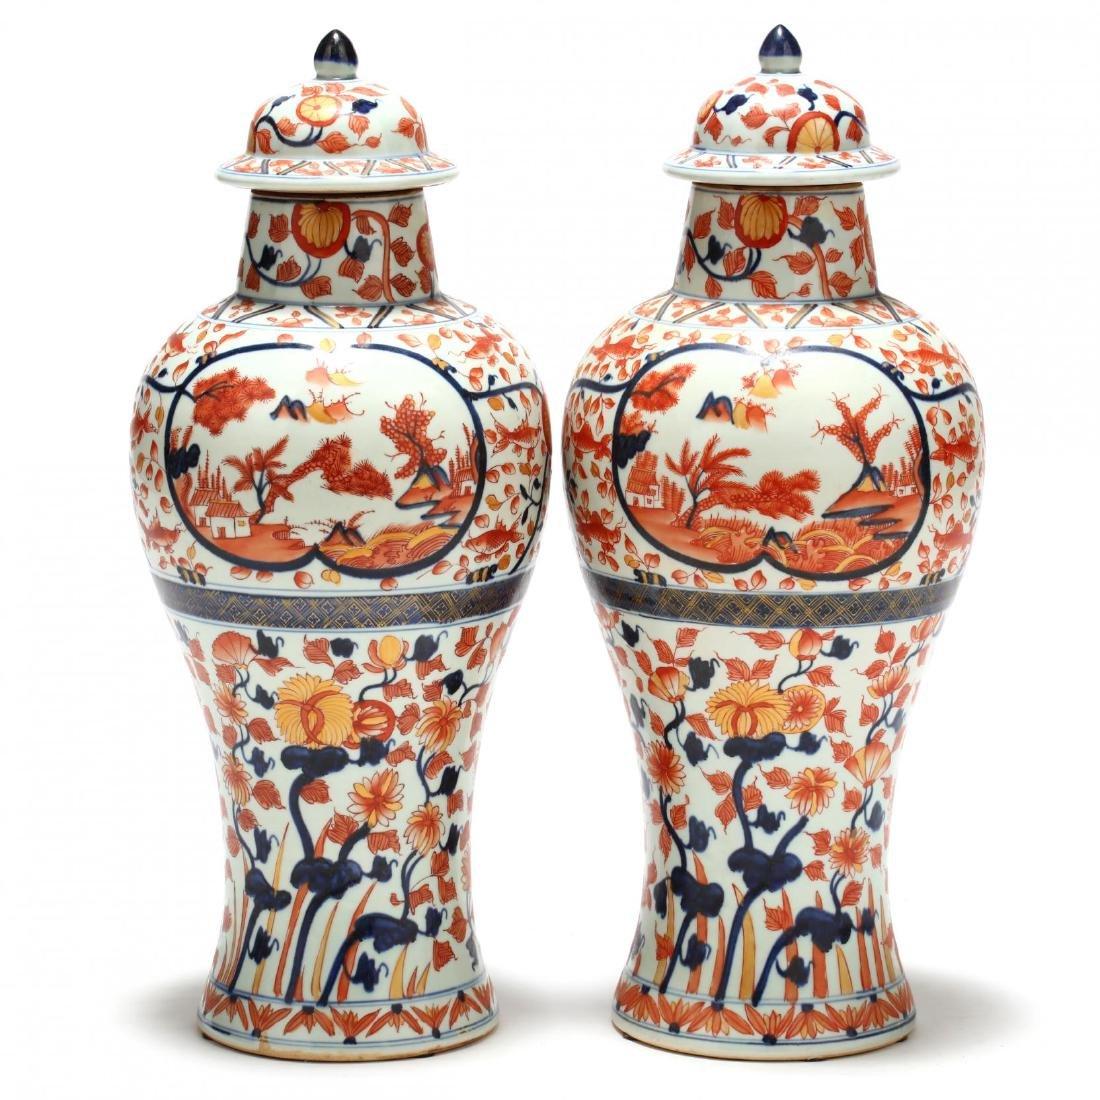 A Pair of Japanese Imari Covered Jars - 2